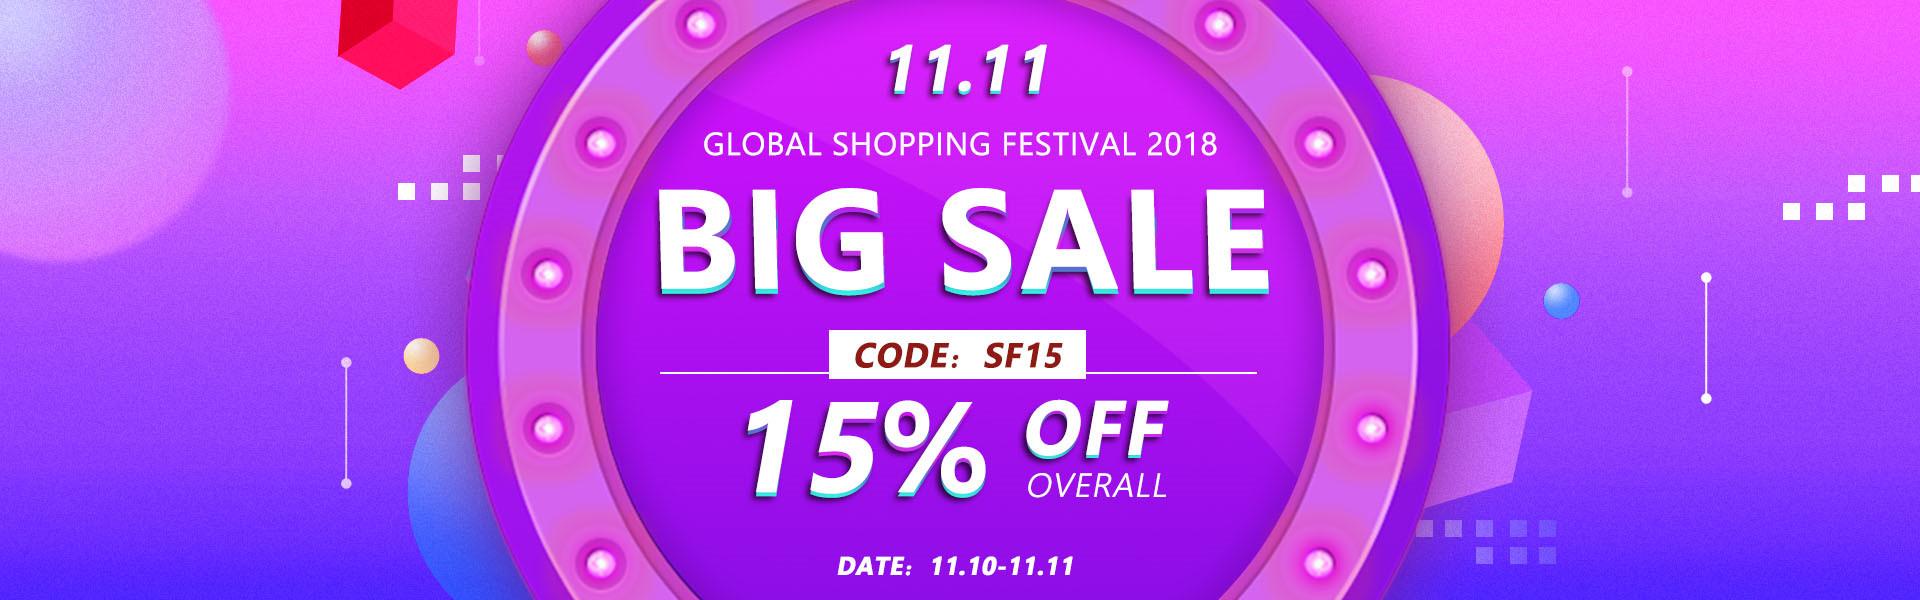 UNice 11.11 Big Hair Sale 2018